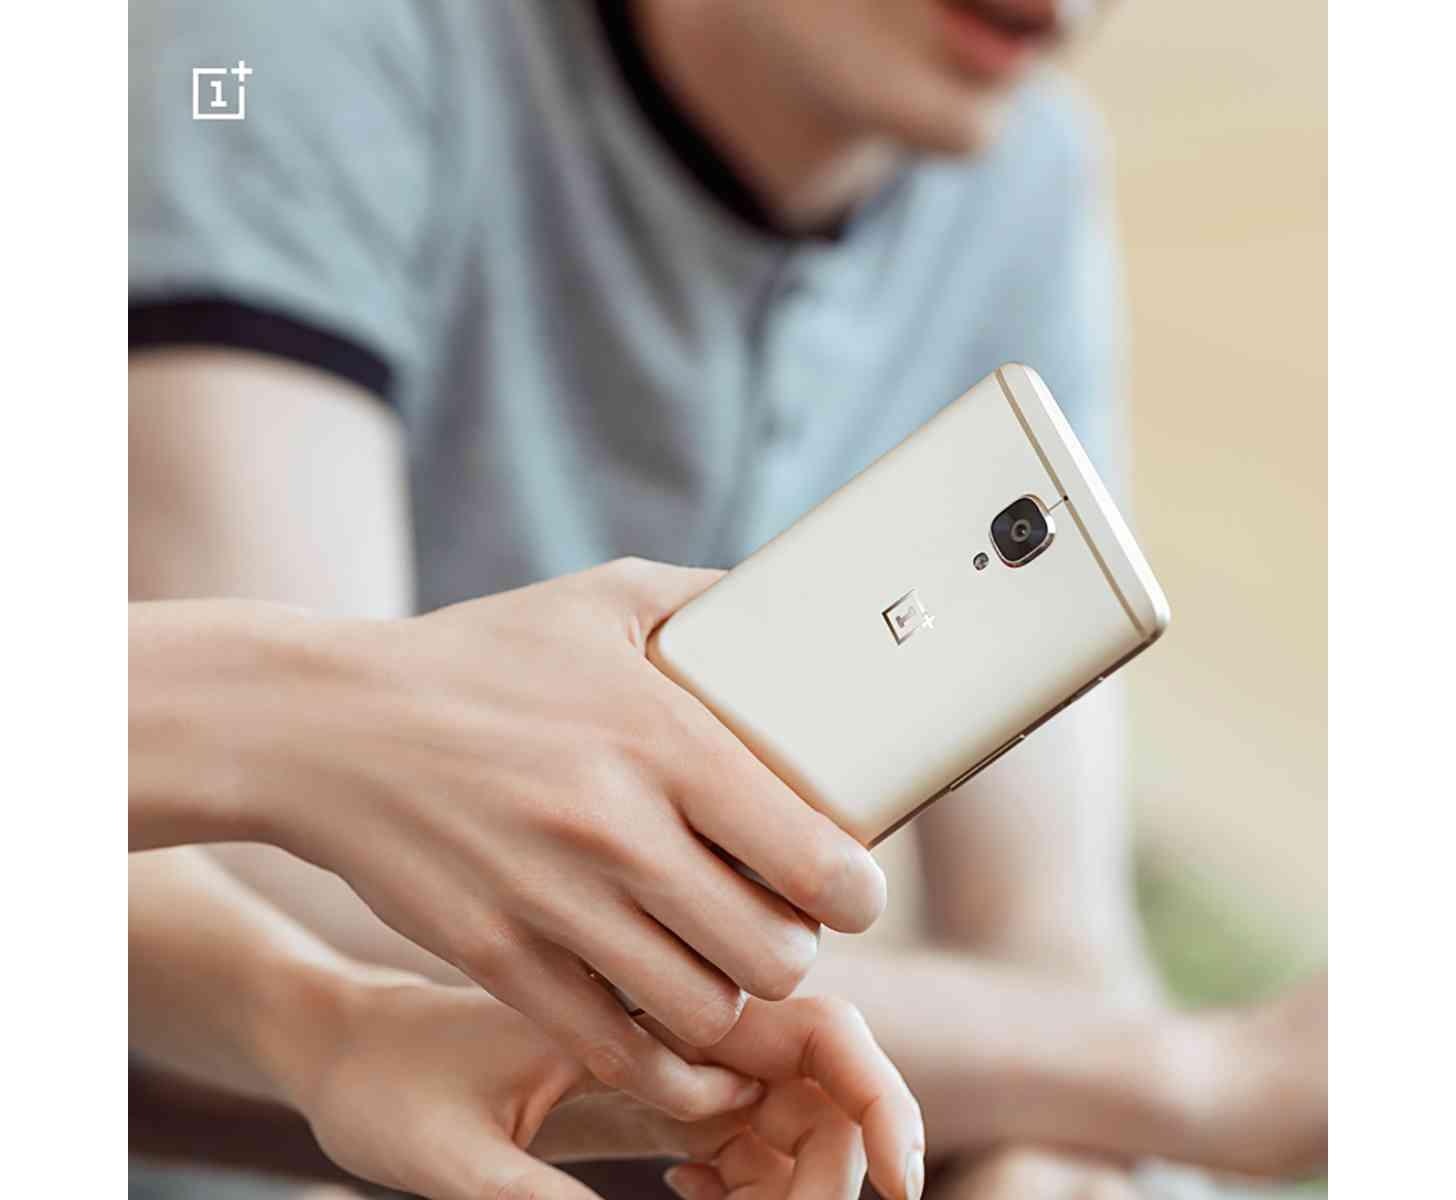 OnePlus 3 Soft Gold teaser image